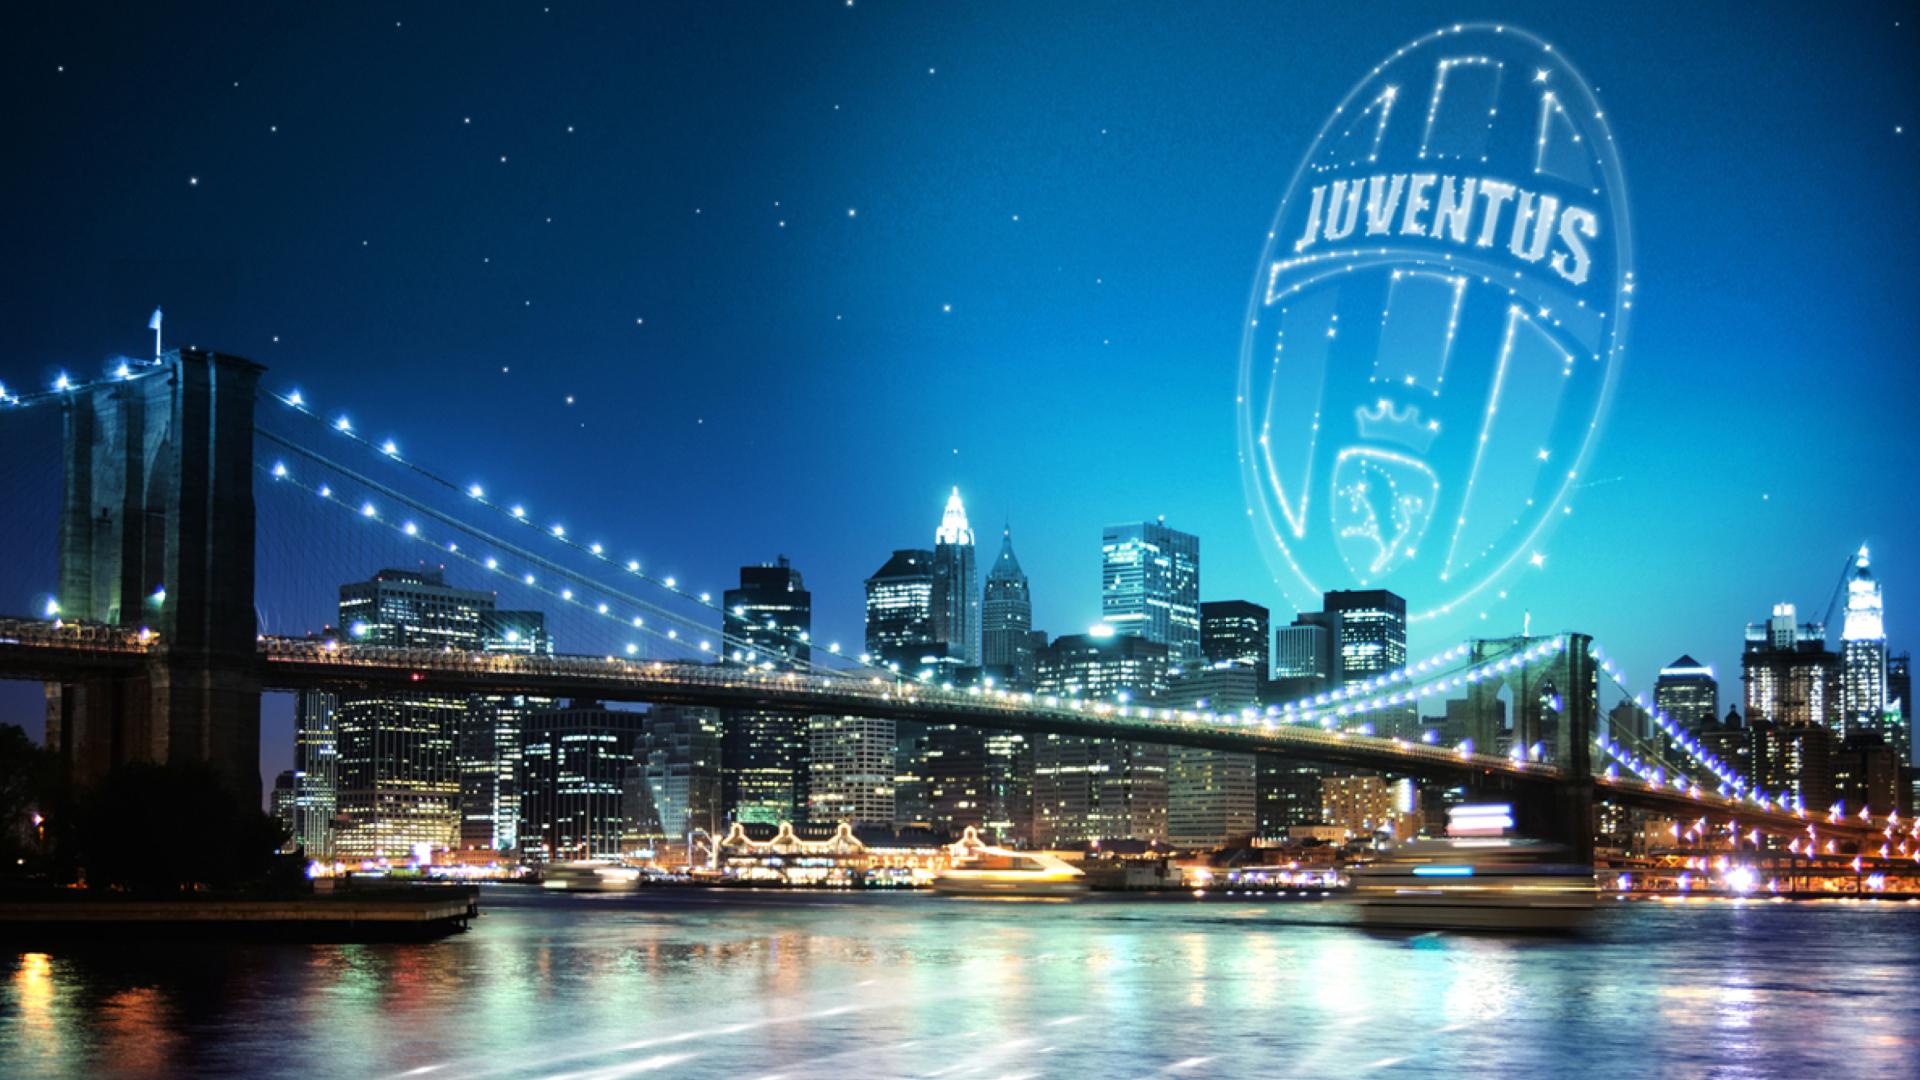 Juventus sfondi gratuiti per desktop 1920x1080 full hd for Sfondi 1920x1080